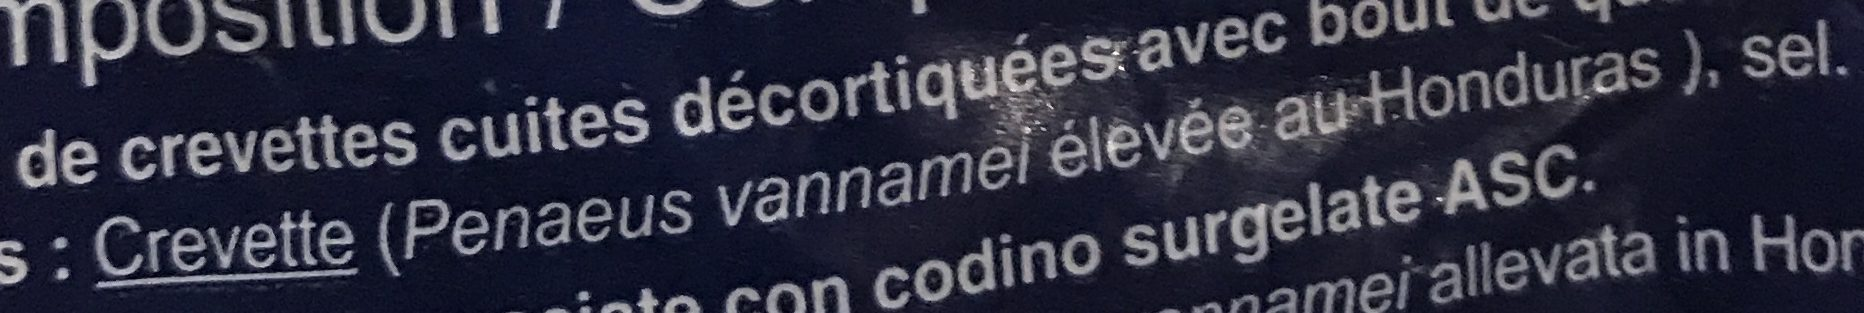 Queues de crevettes - Ingredientes - fr